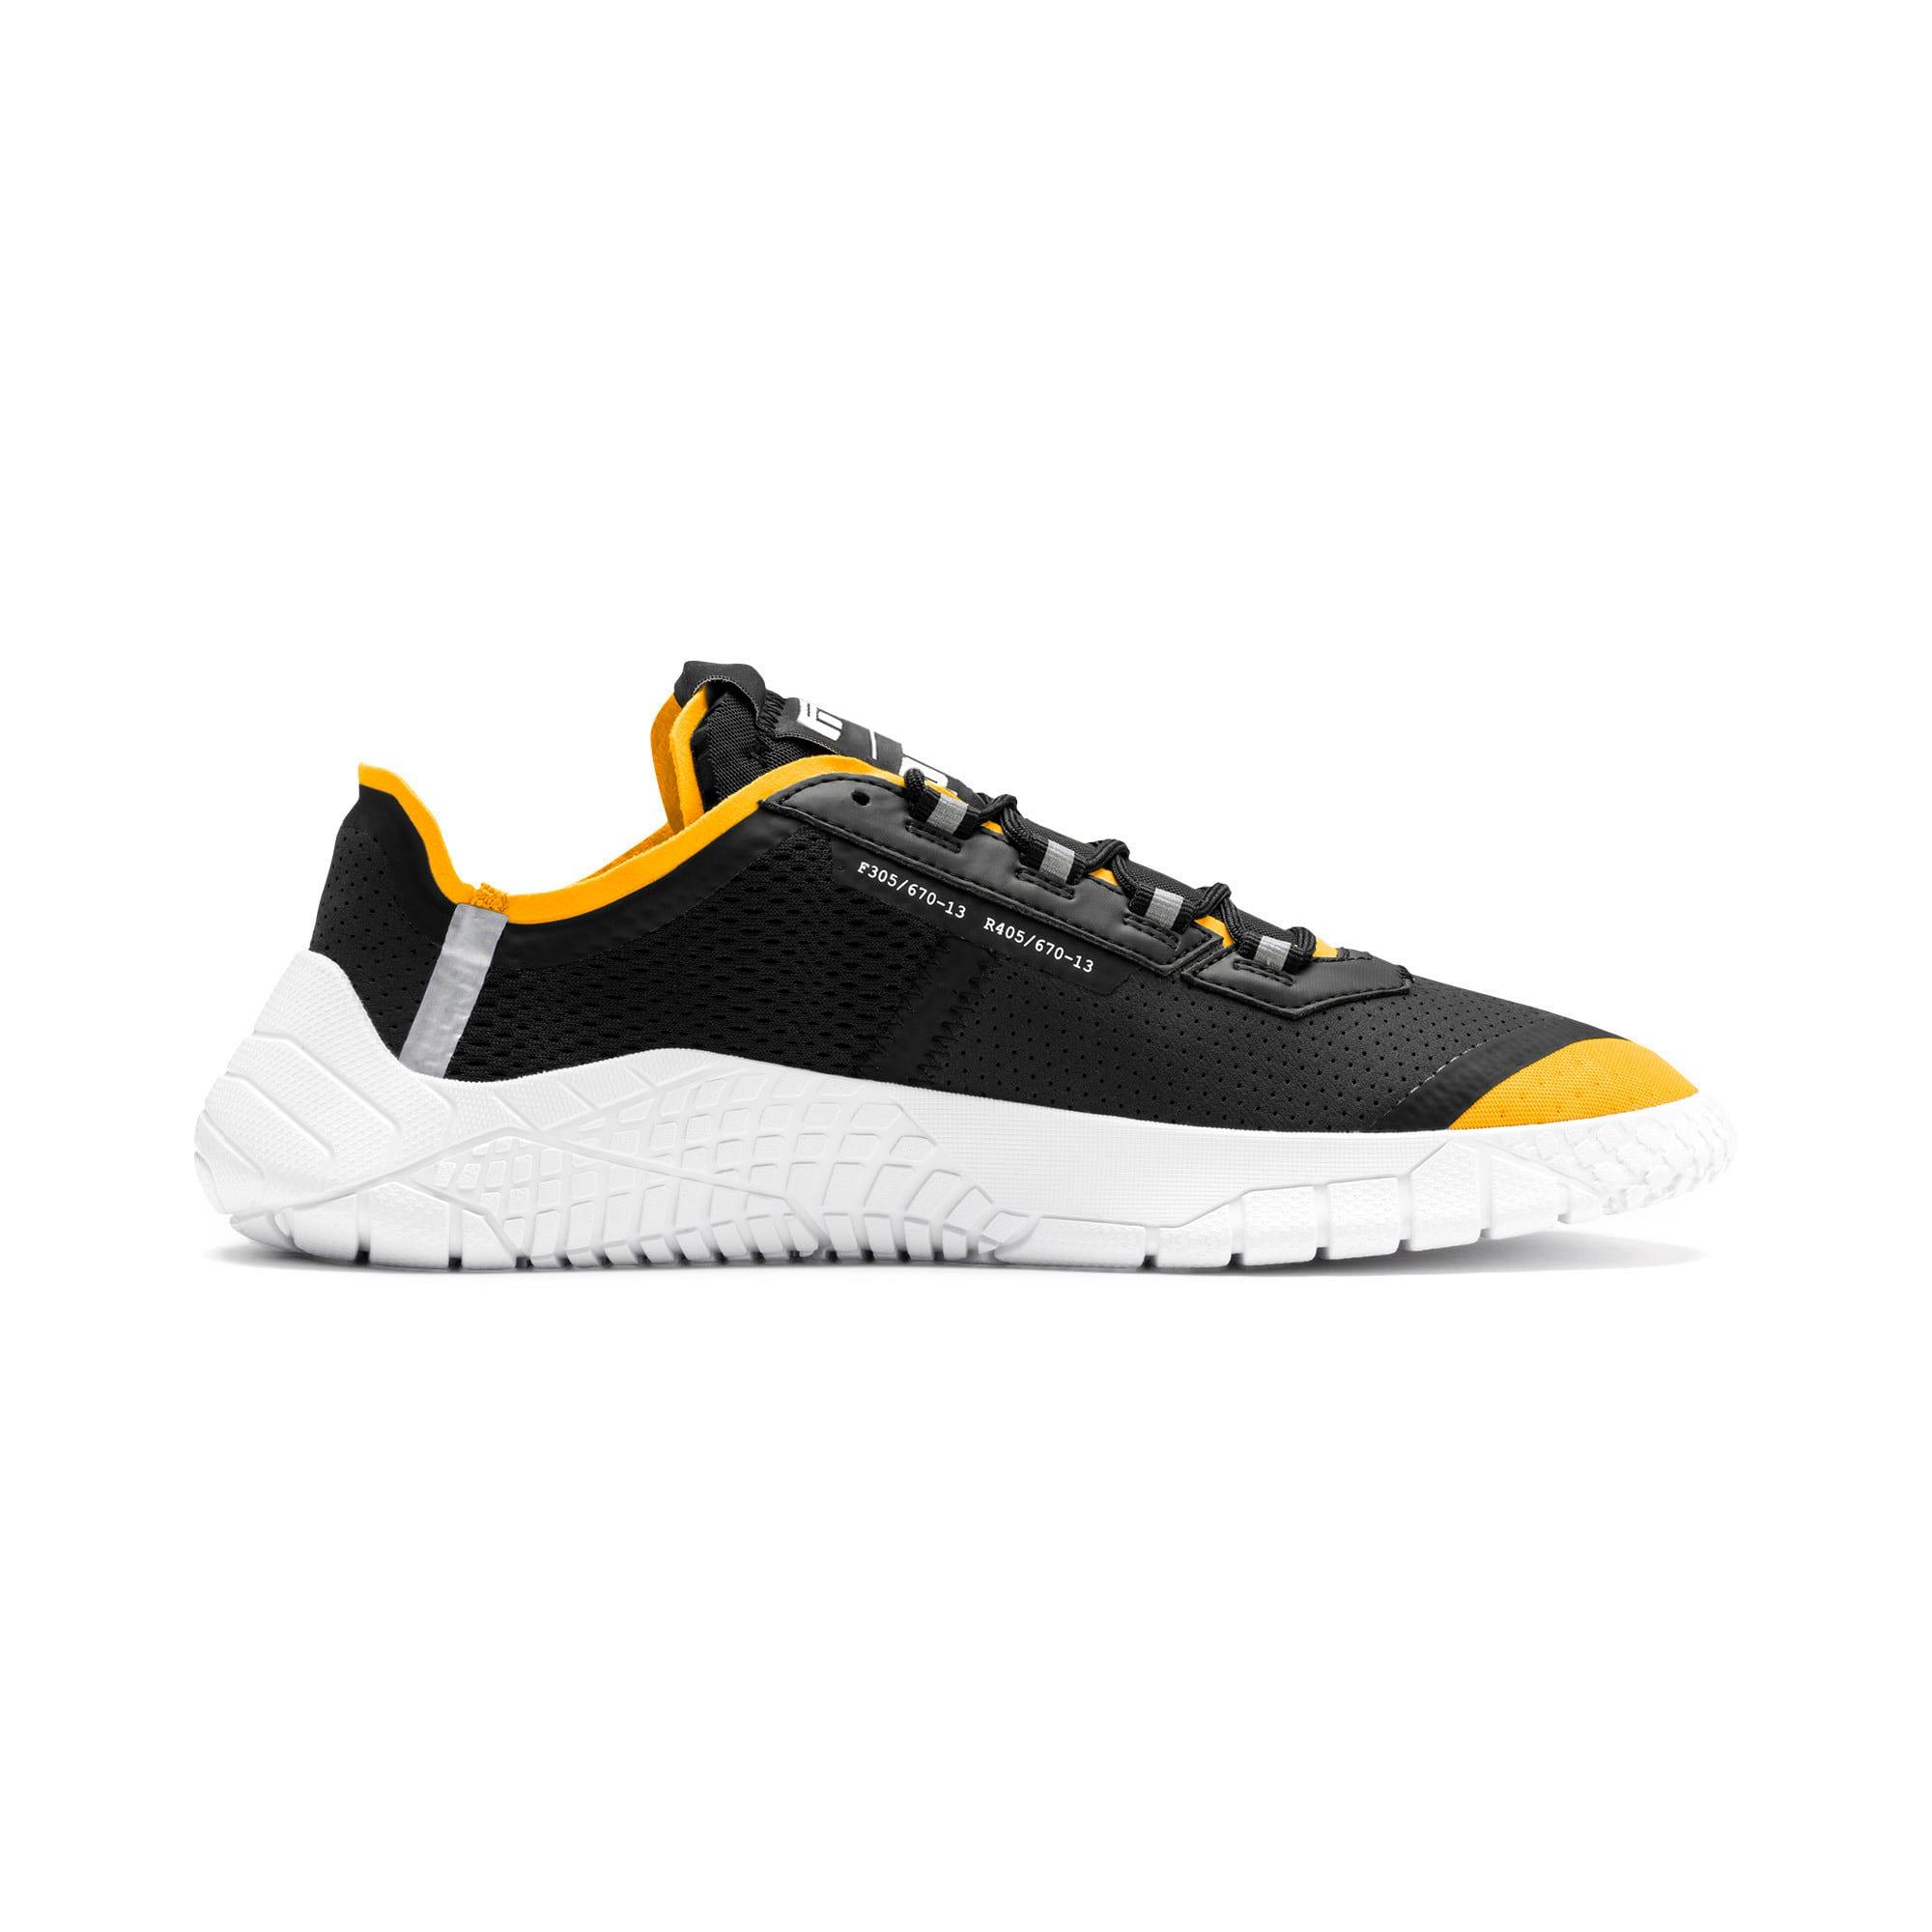 Thumbnail 6 of Replicat-X Pirelli Motorsport Shoes, Puma Black-Puma White-Zinnia, medium